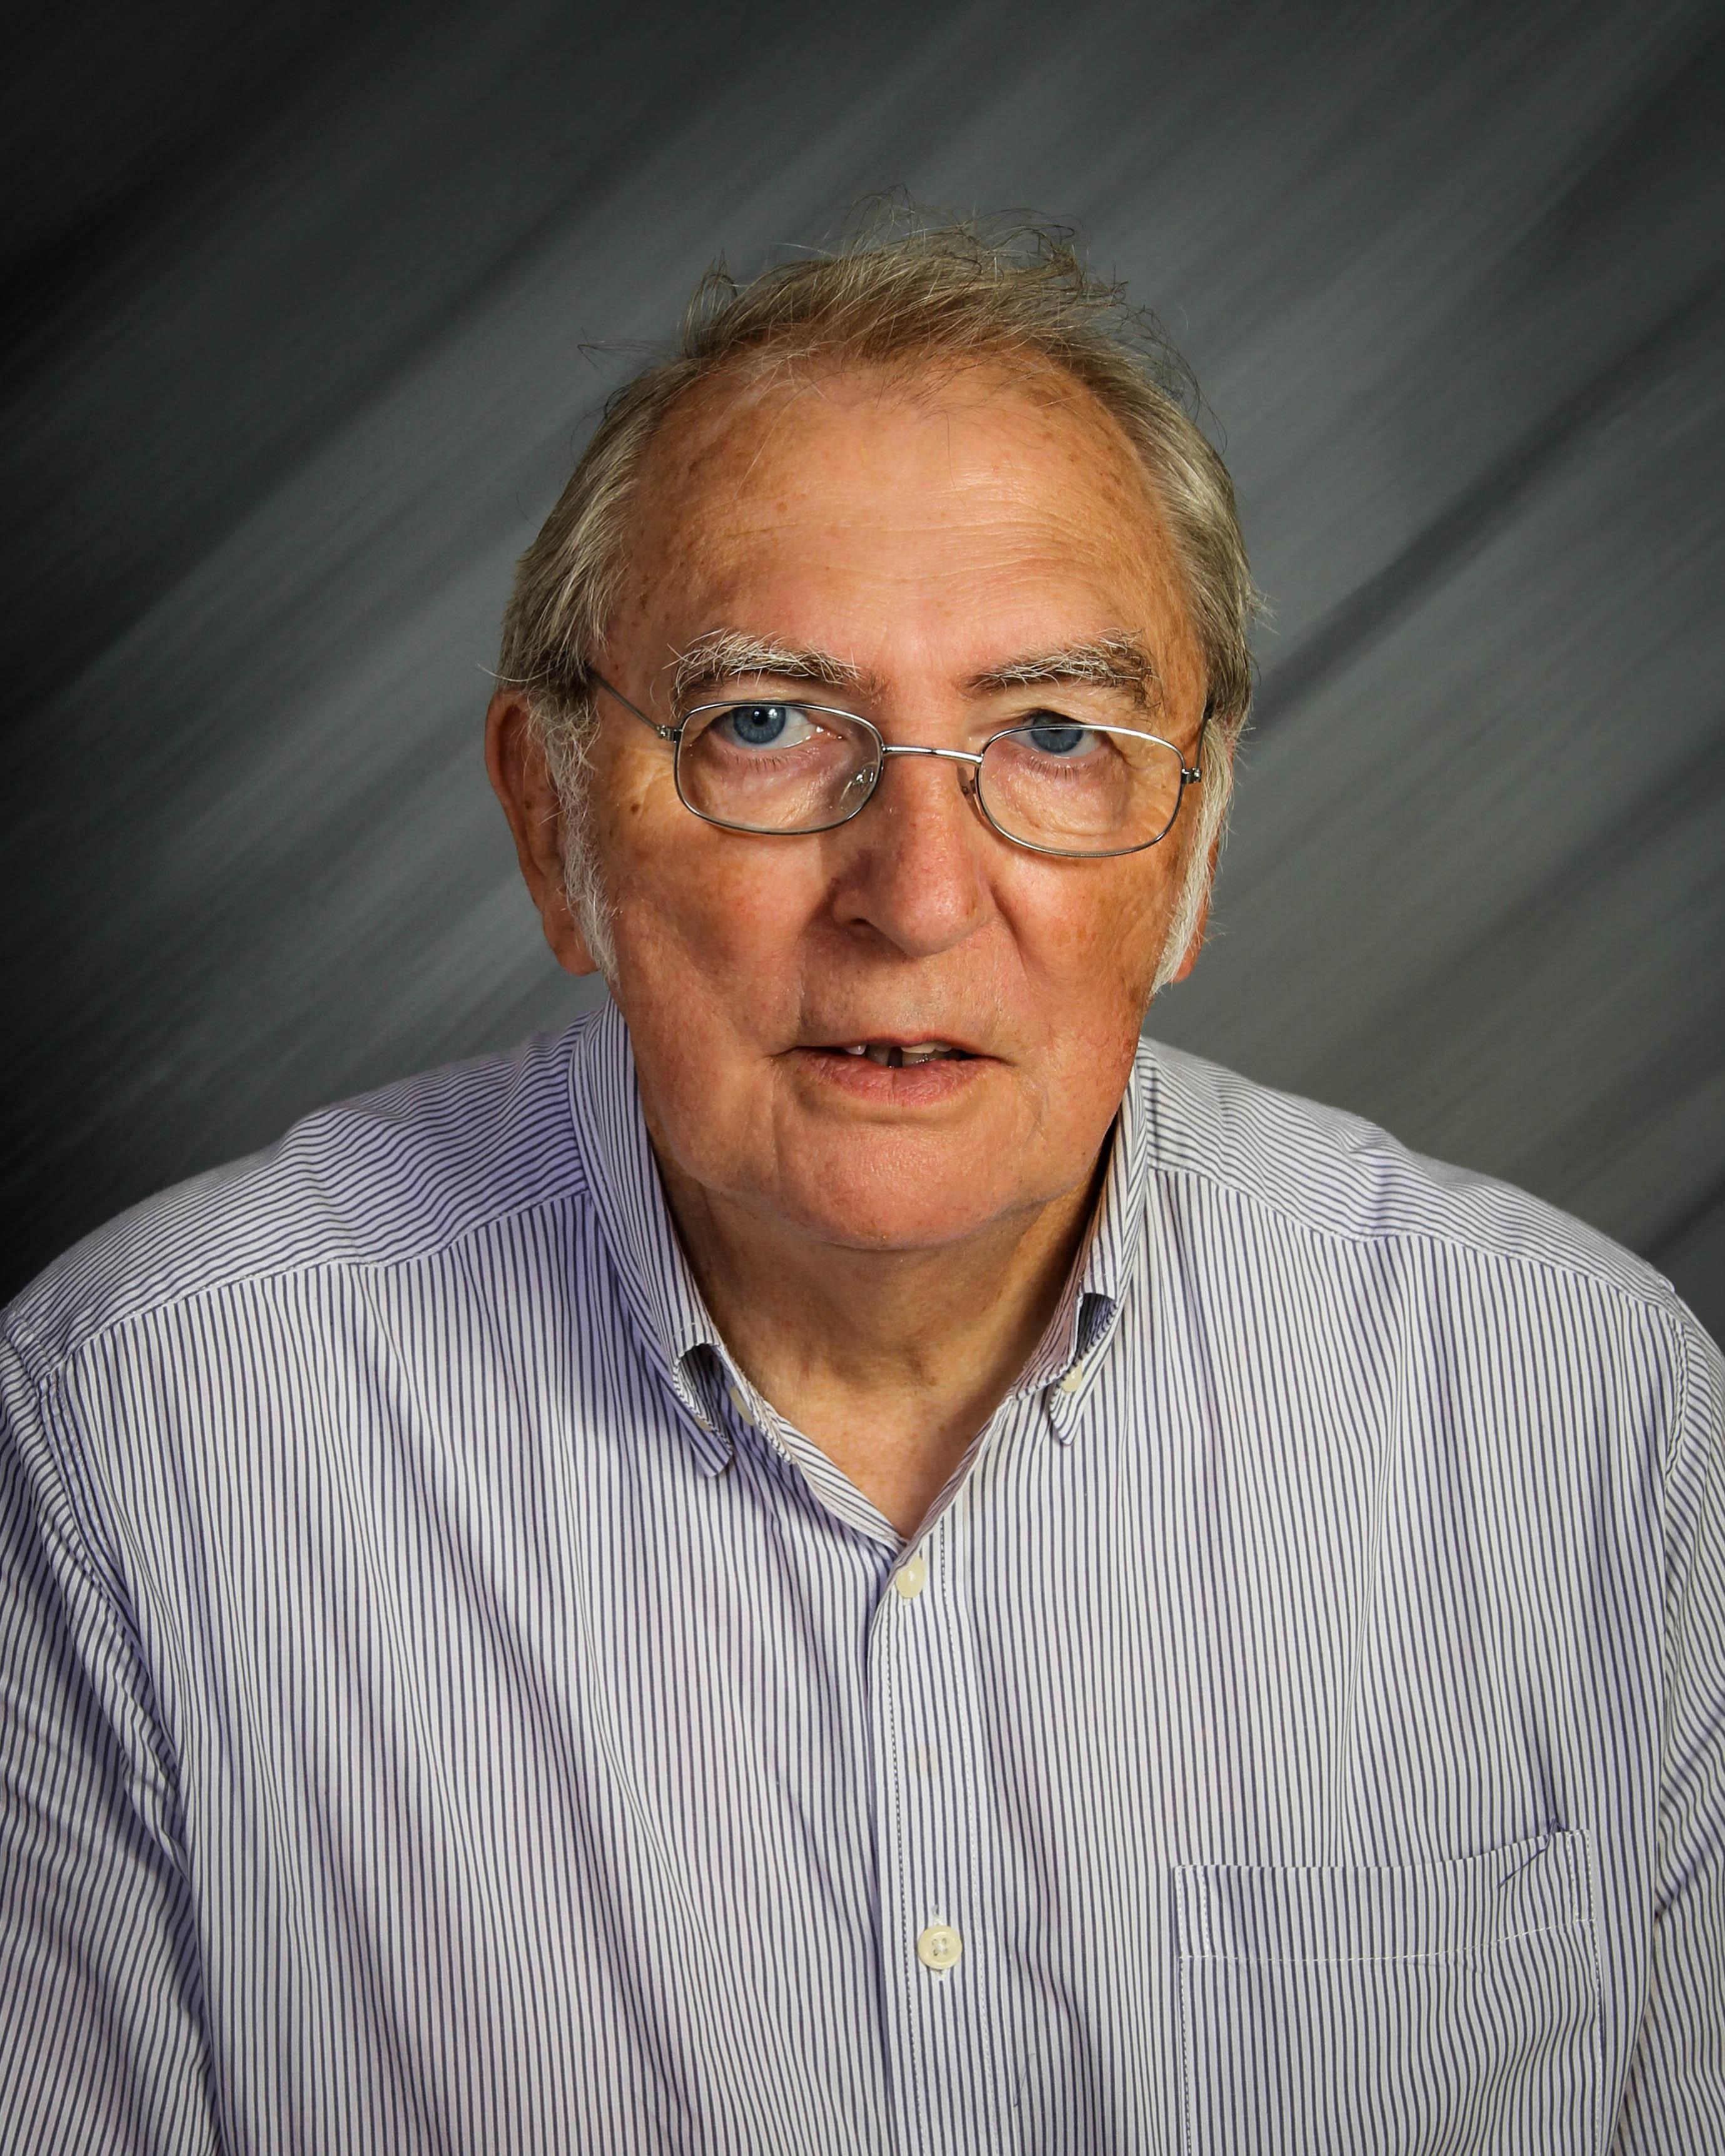 James-Sheridan